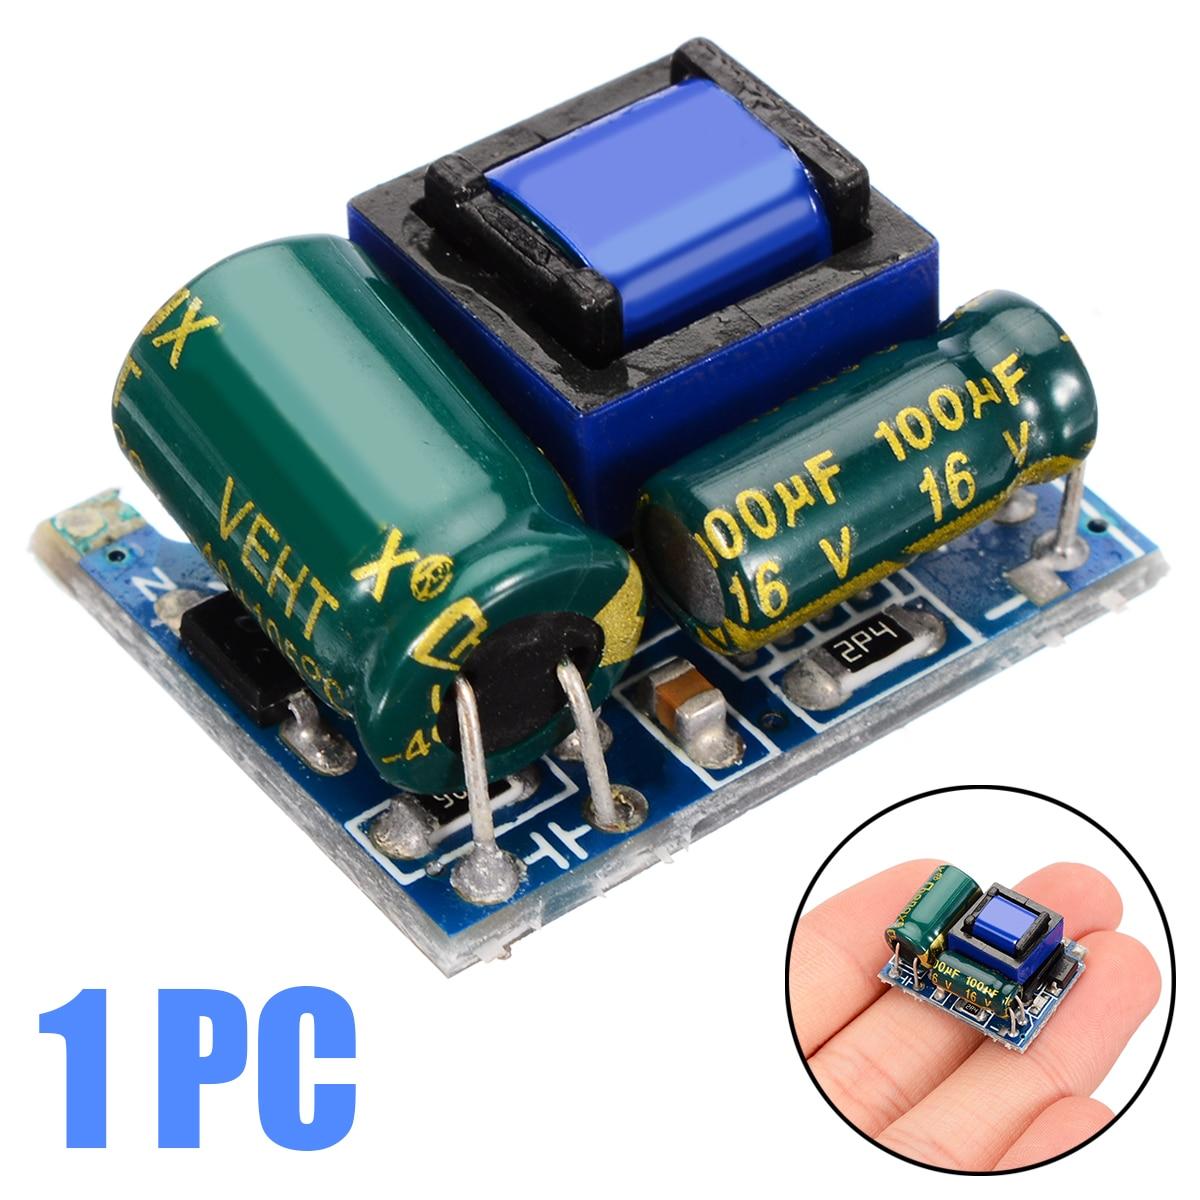 1A AC-DC AC 110V 220V 230V 240V to DC 5V Converter Switching Power Supply Board